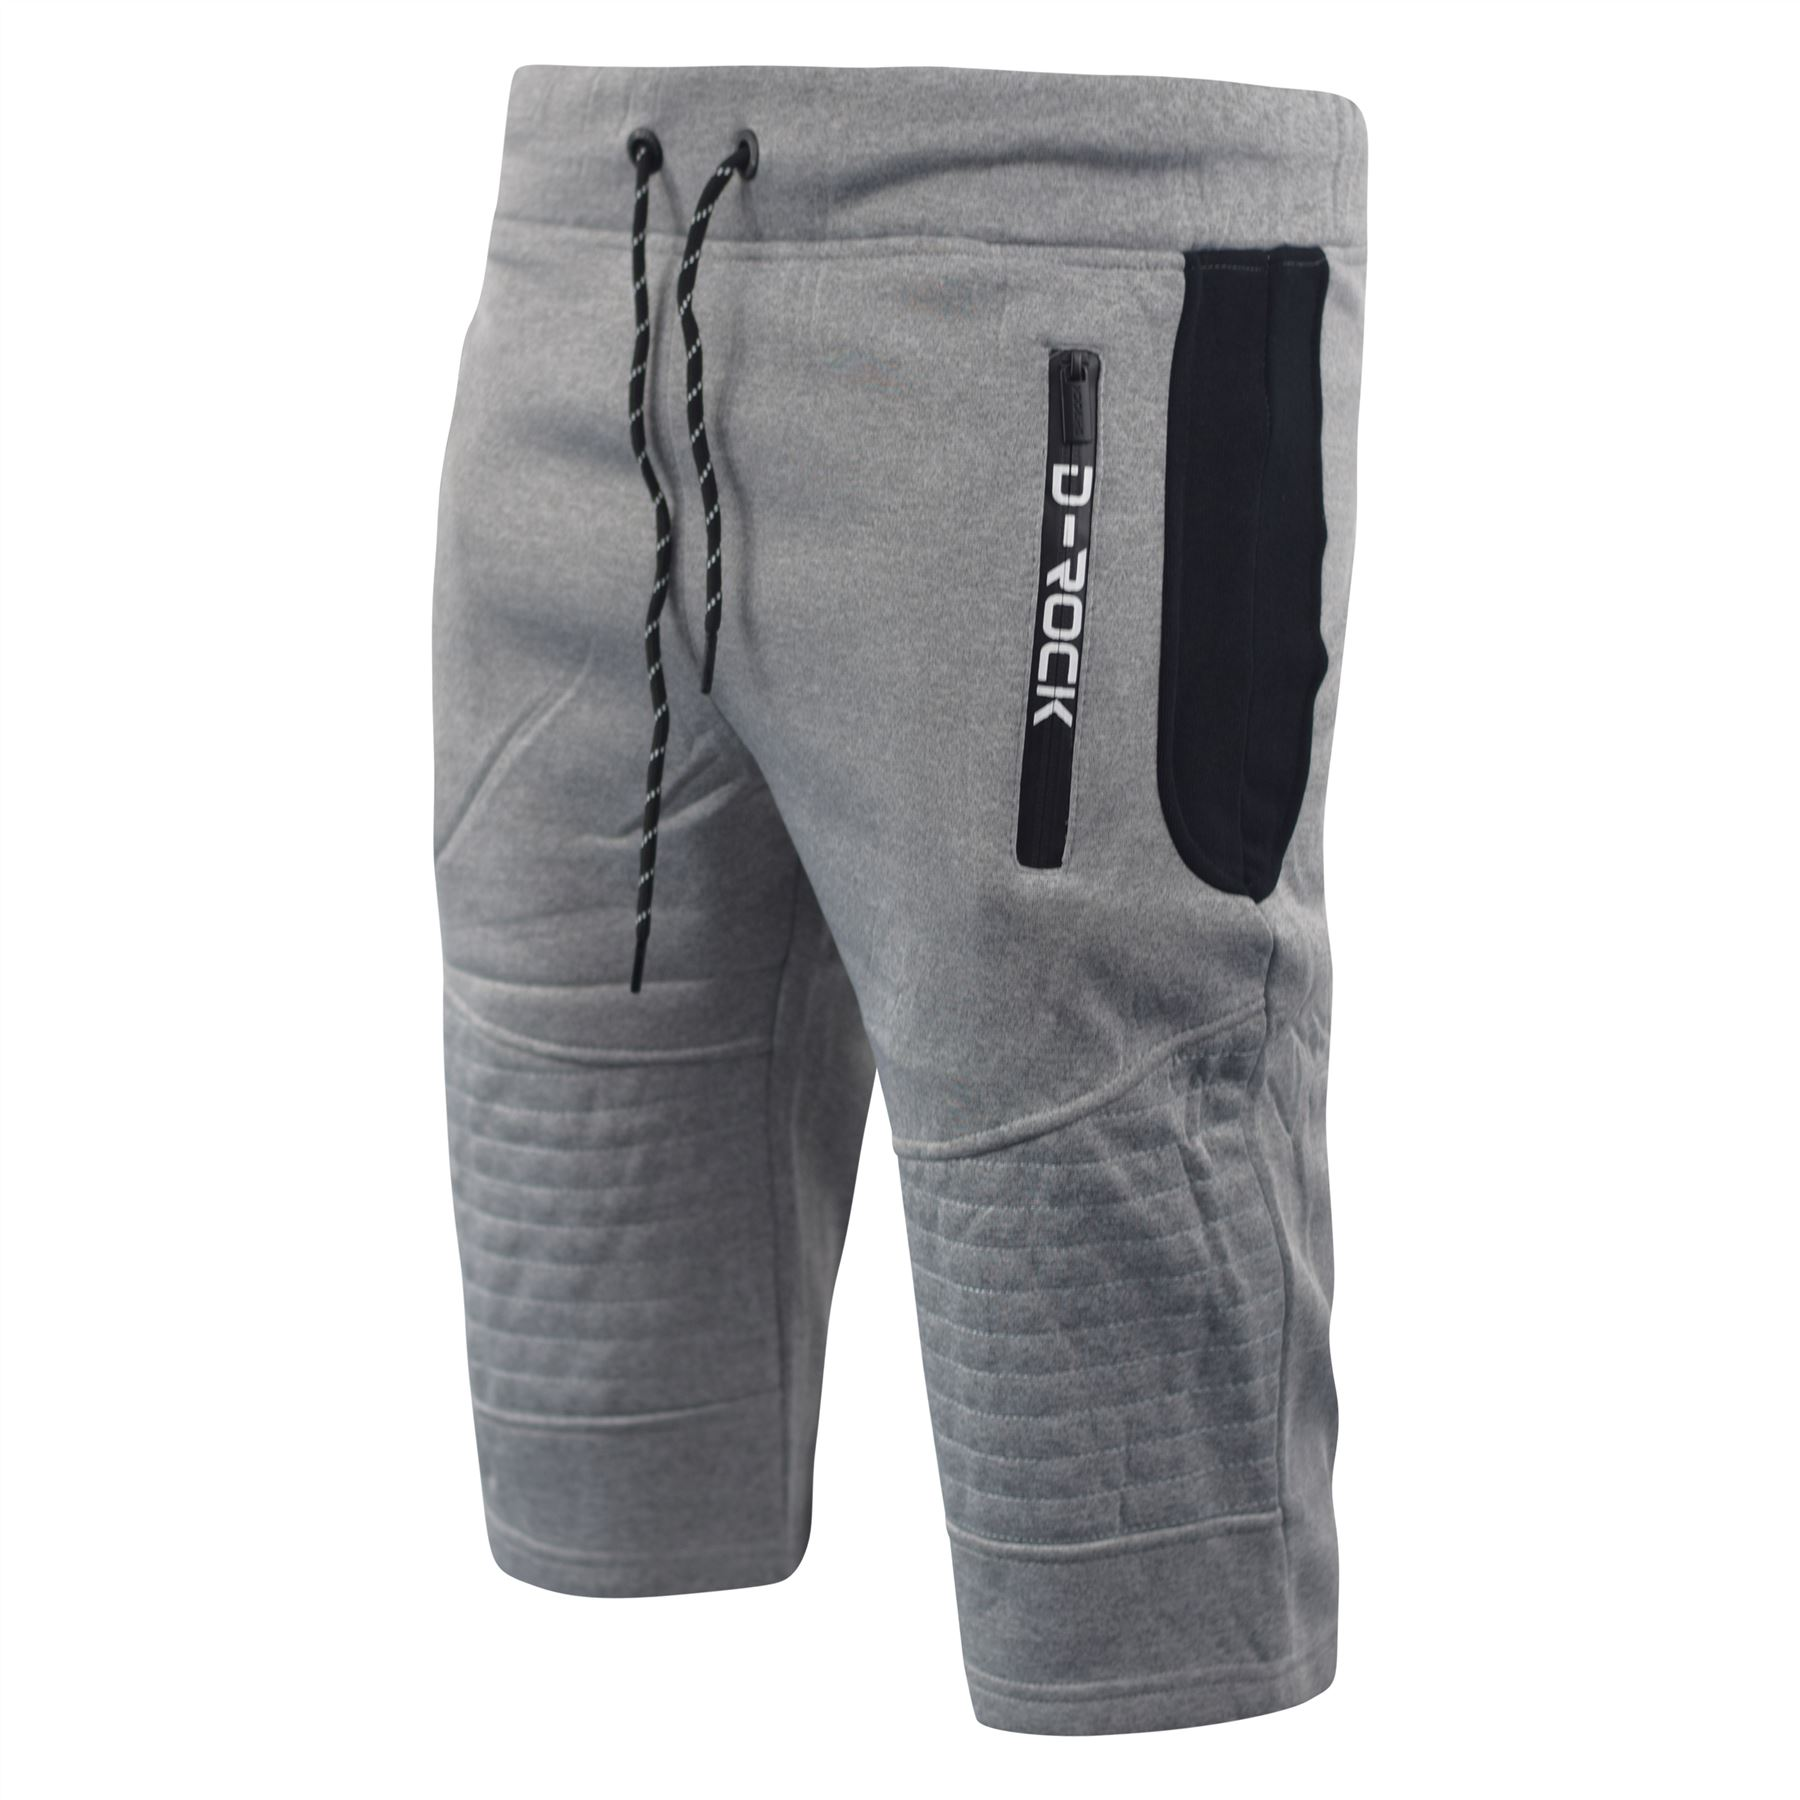 Mens-Jogger-3-4-Shorts-D-Rock-Half-Pants-Sport-Trousers-Casual-Bottom thumbnail 5